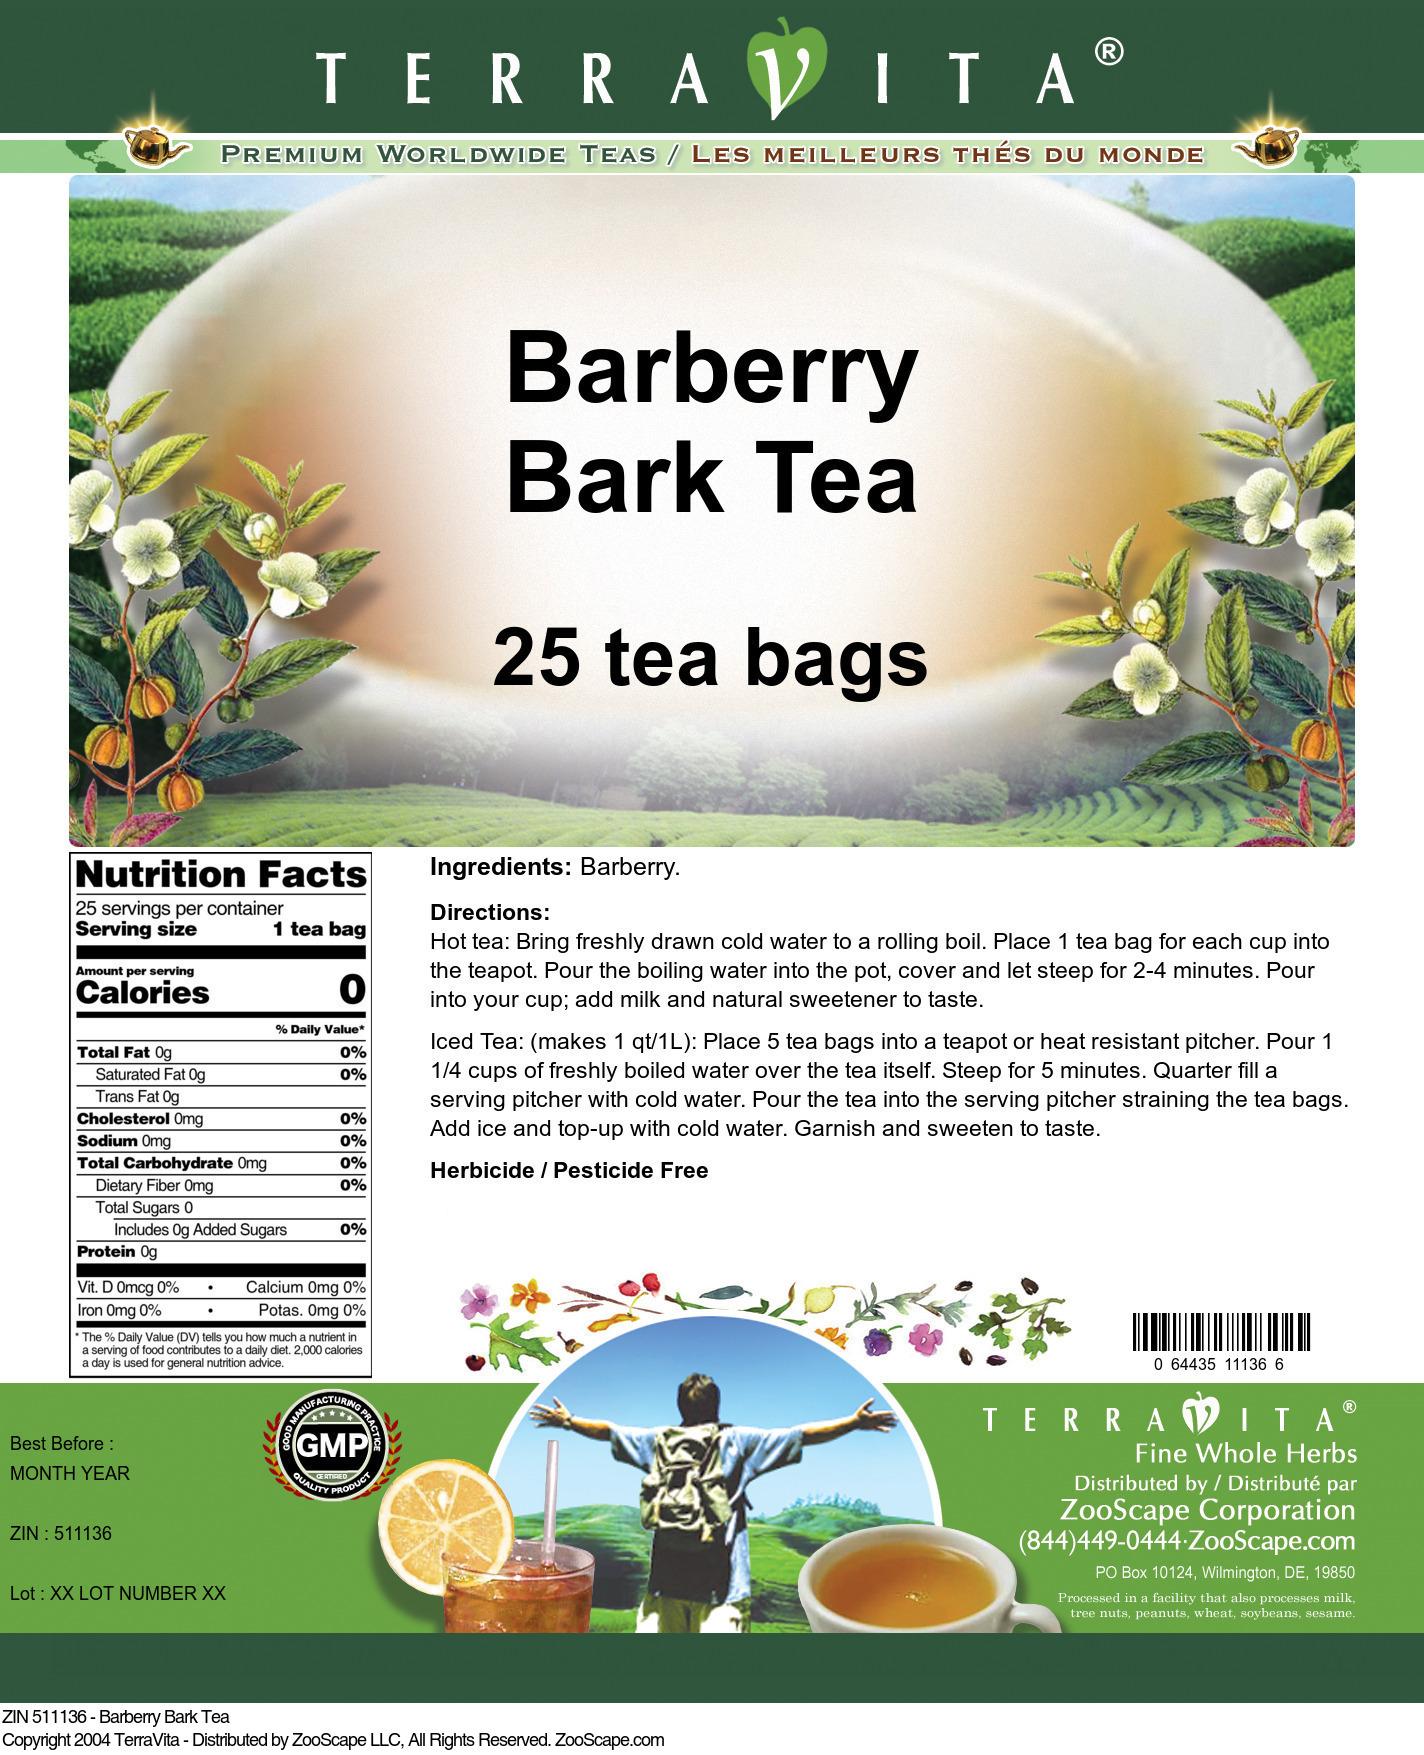 Barberry Bark Tea